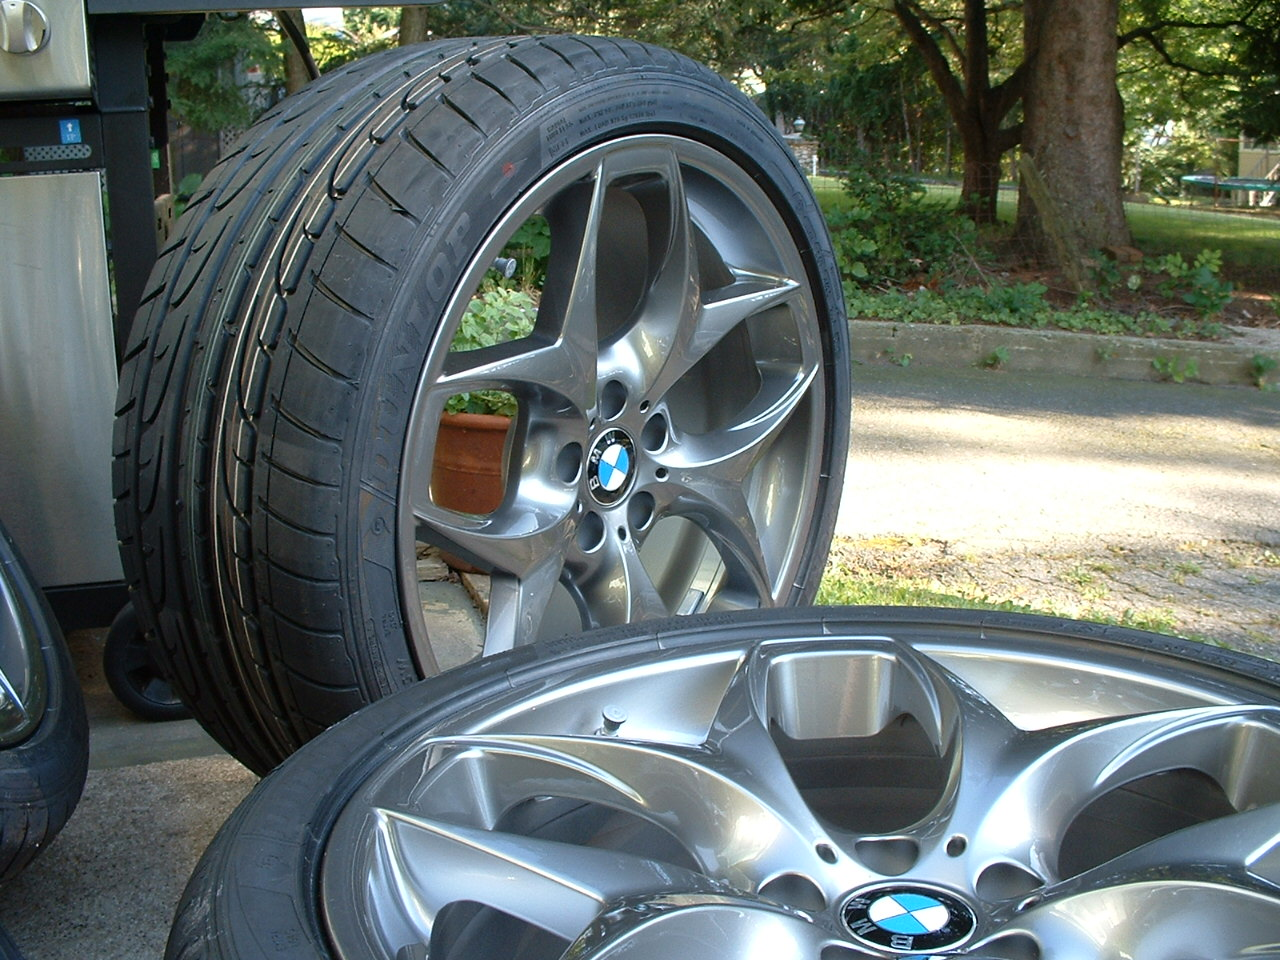 New Oem X5 21 Quot Wheels Tires Amp Tpms E70 E71 X6 Xoutpost Com